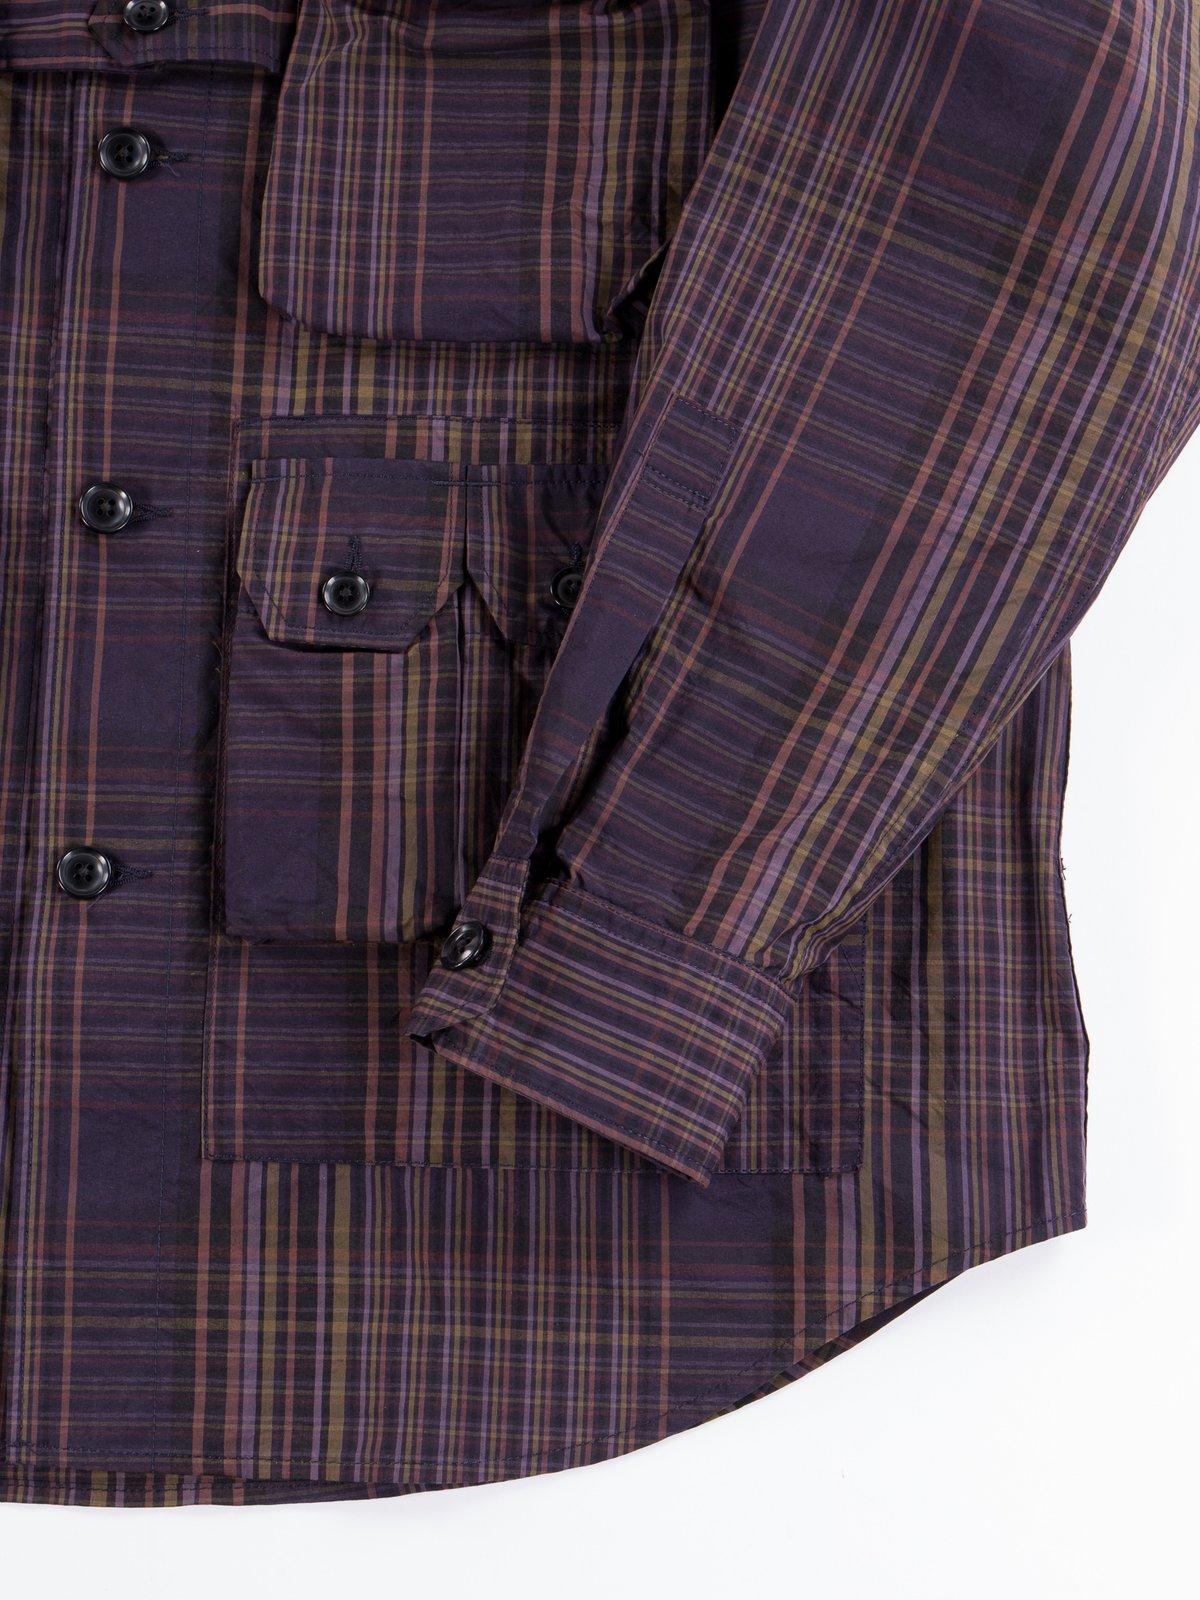 Multi Color Nyco Plaid Explorer Shirt Jacket - Image 5